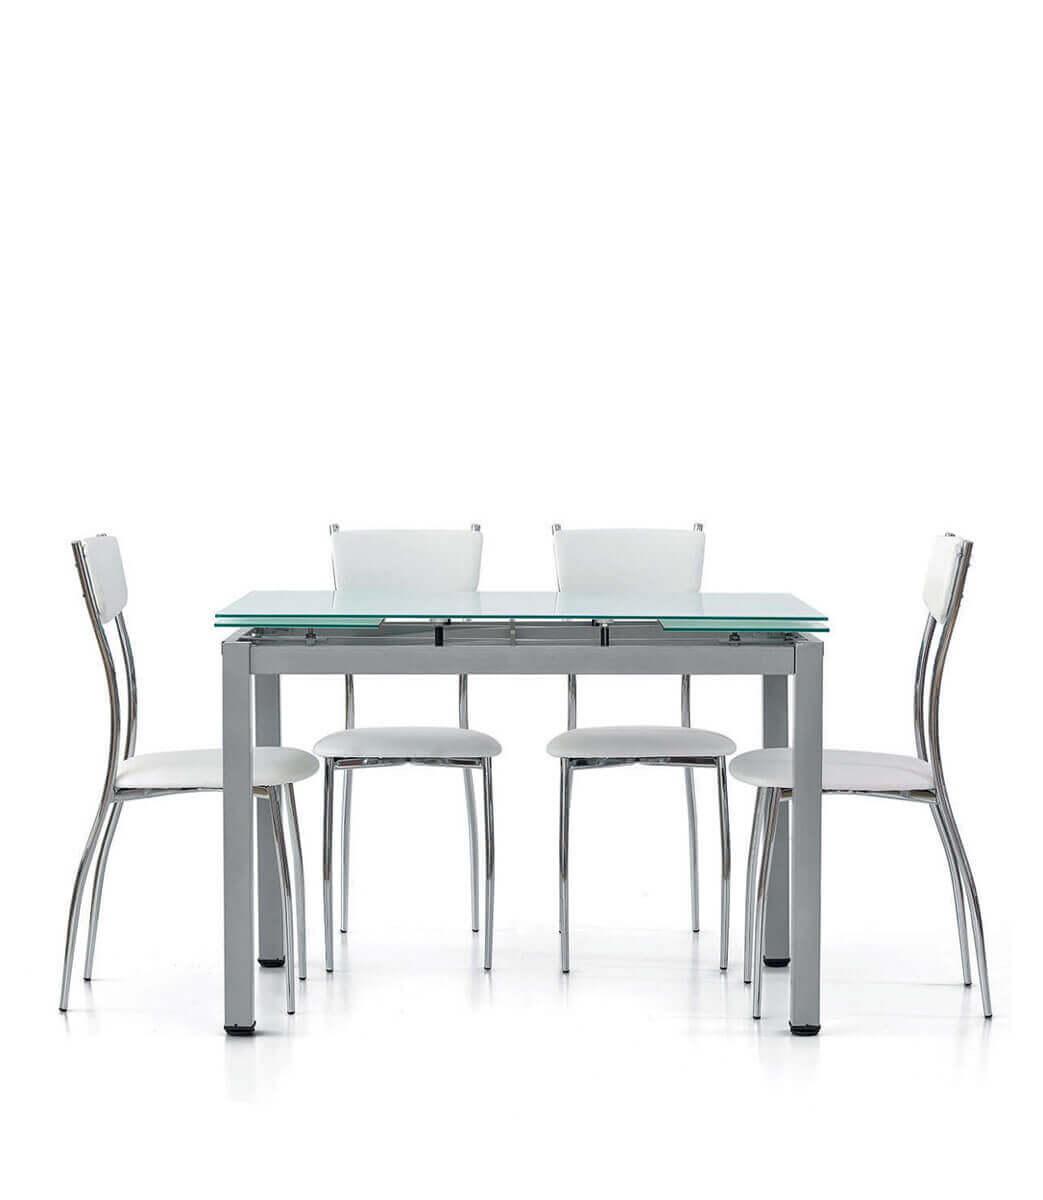 Sedie Moderne In Ecopelle.Sedie Moderne In Acciaio Cromato Seduta E Schienale In Ecopelle Spazio Casa